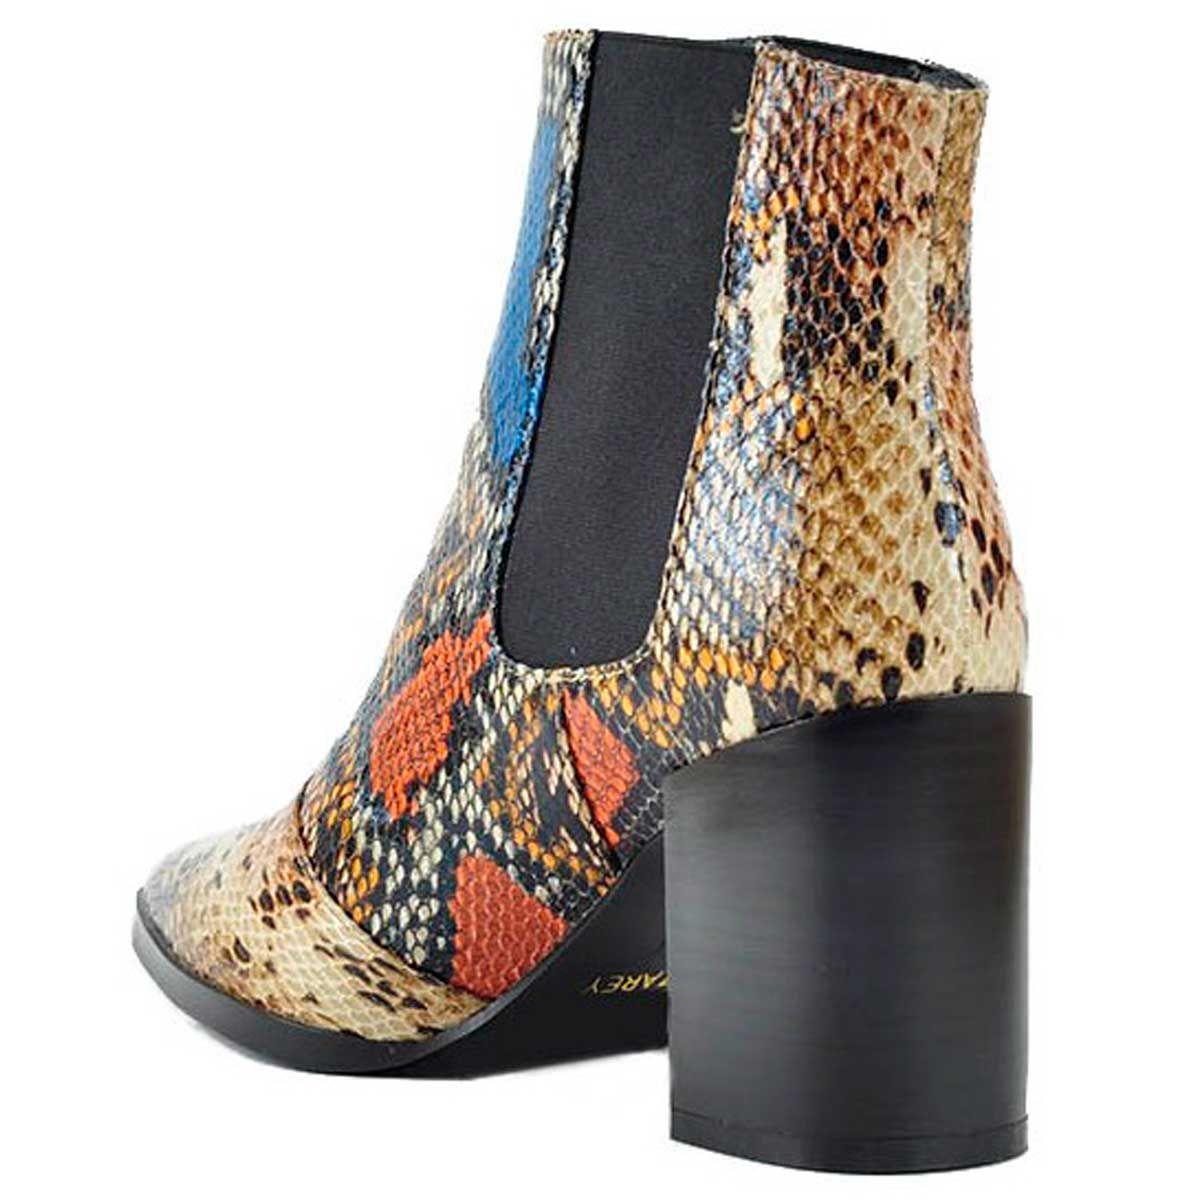 Montevita Heeled Ankle Boot in Multicolour Snake